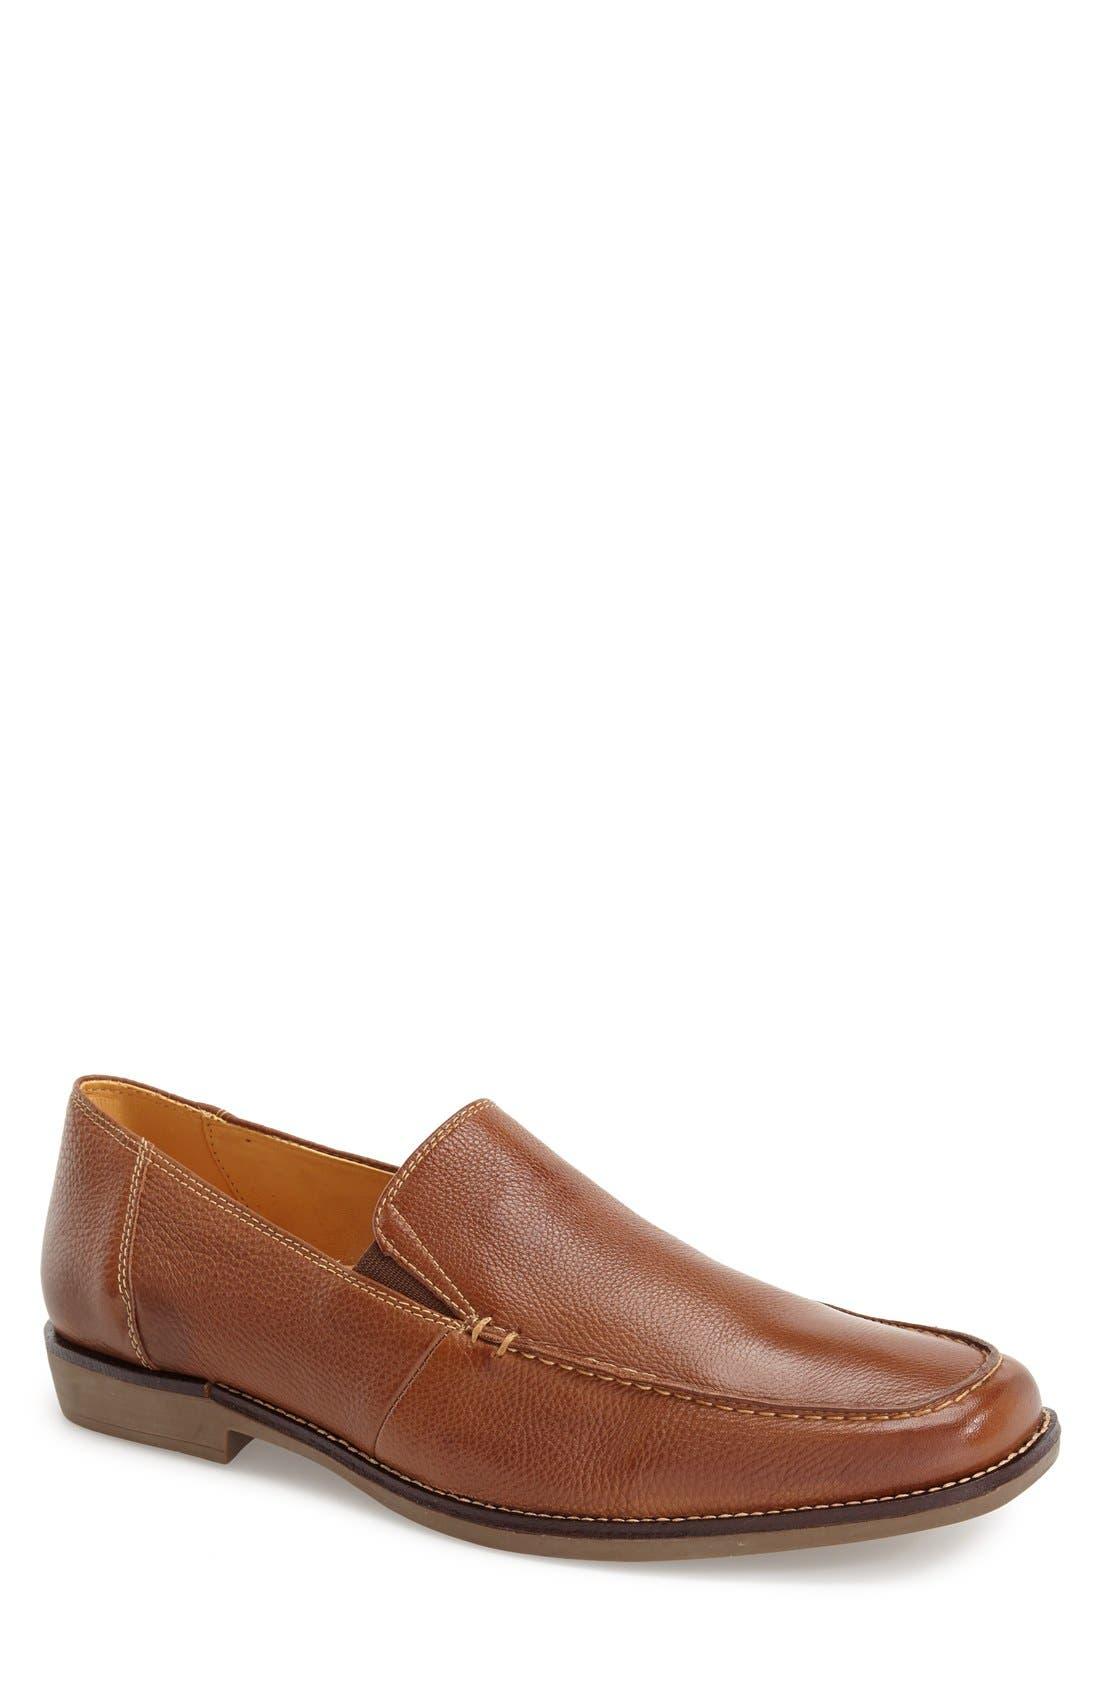 Sandro Moscoloni 'Easy' Leather Venetian Loafer (Men)